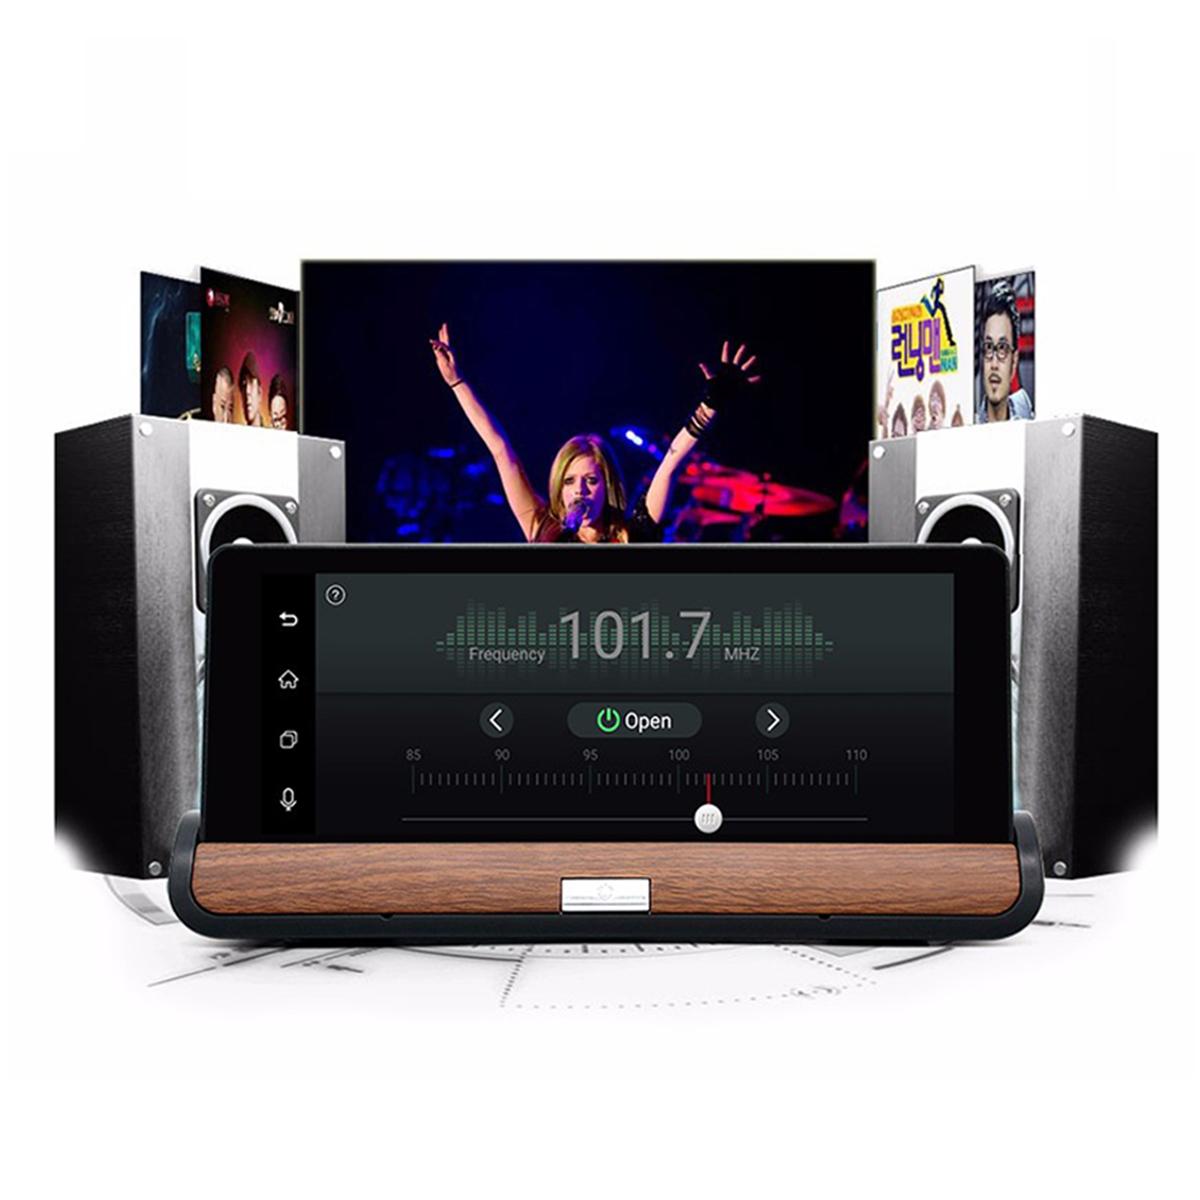 Car DVR Kit 7 Inch Car Display 2 Cameras GPS Navigation Android OS 1080p Recording